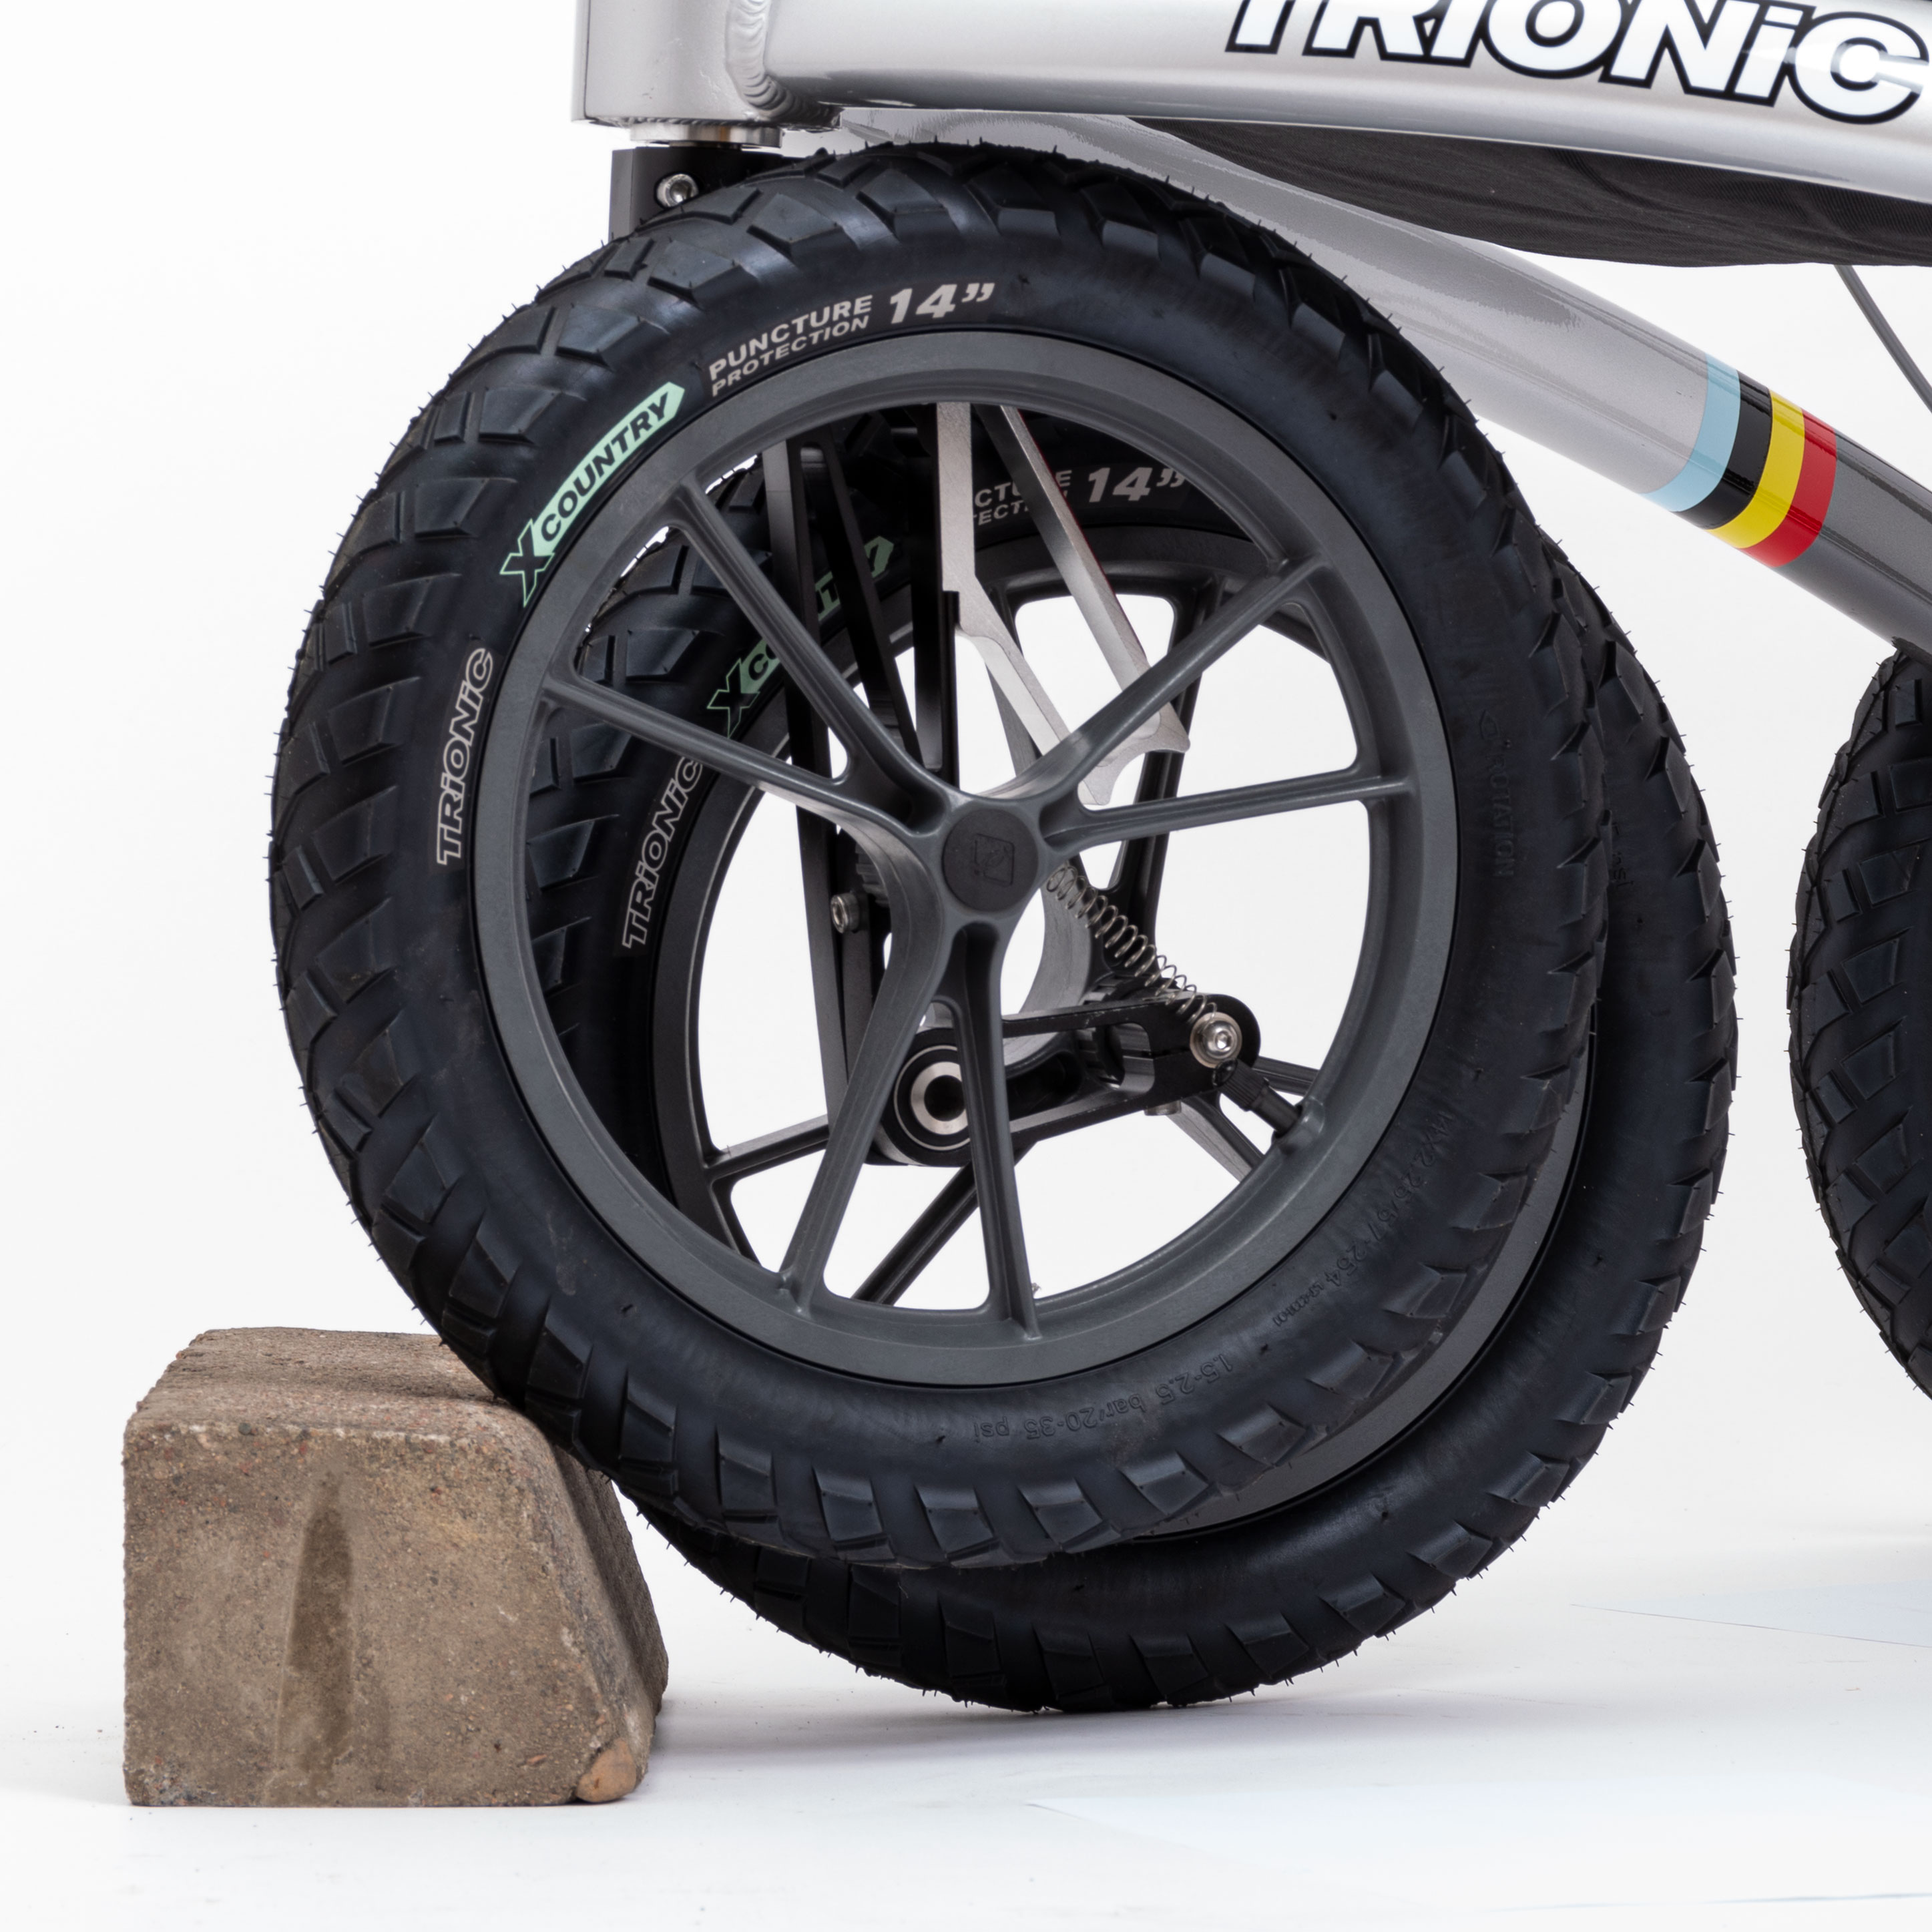 Trionic Climbing Wheel